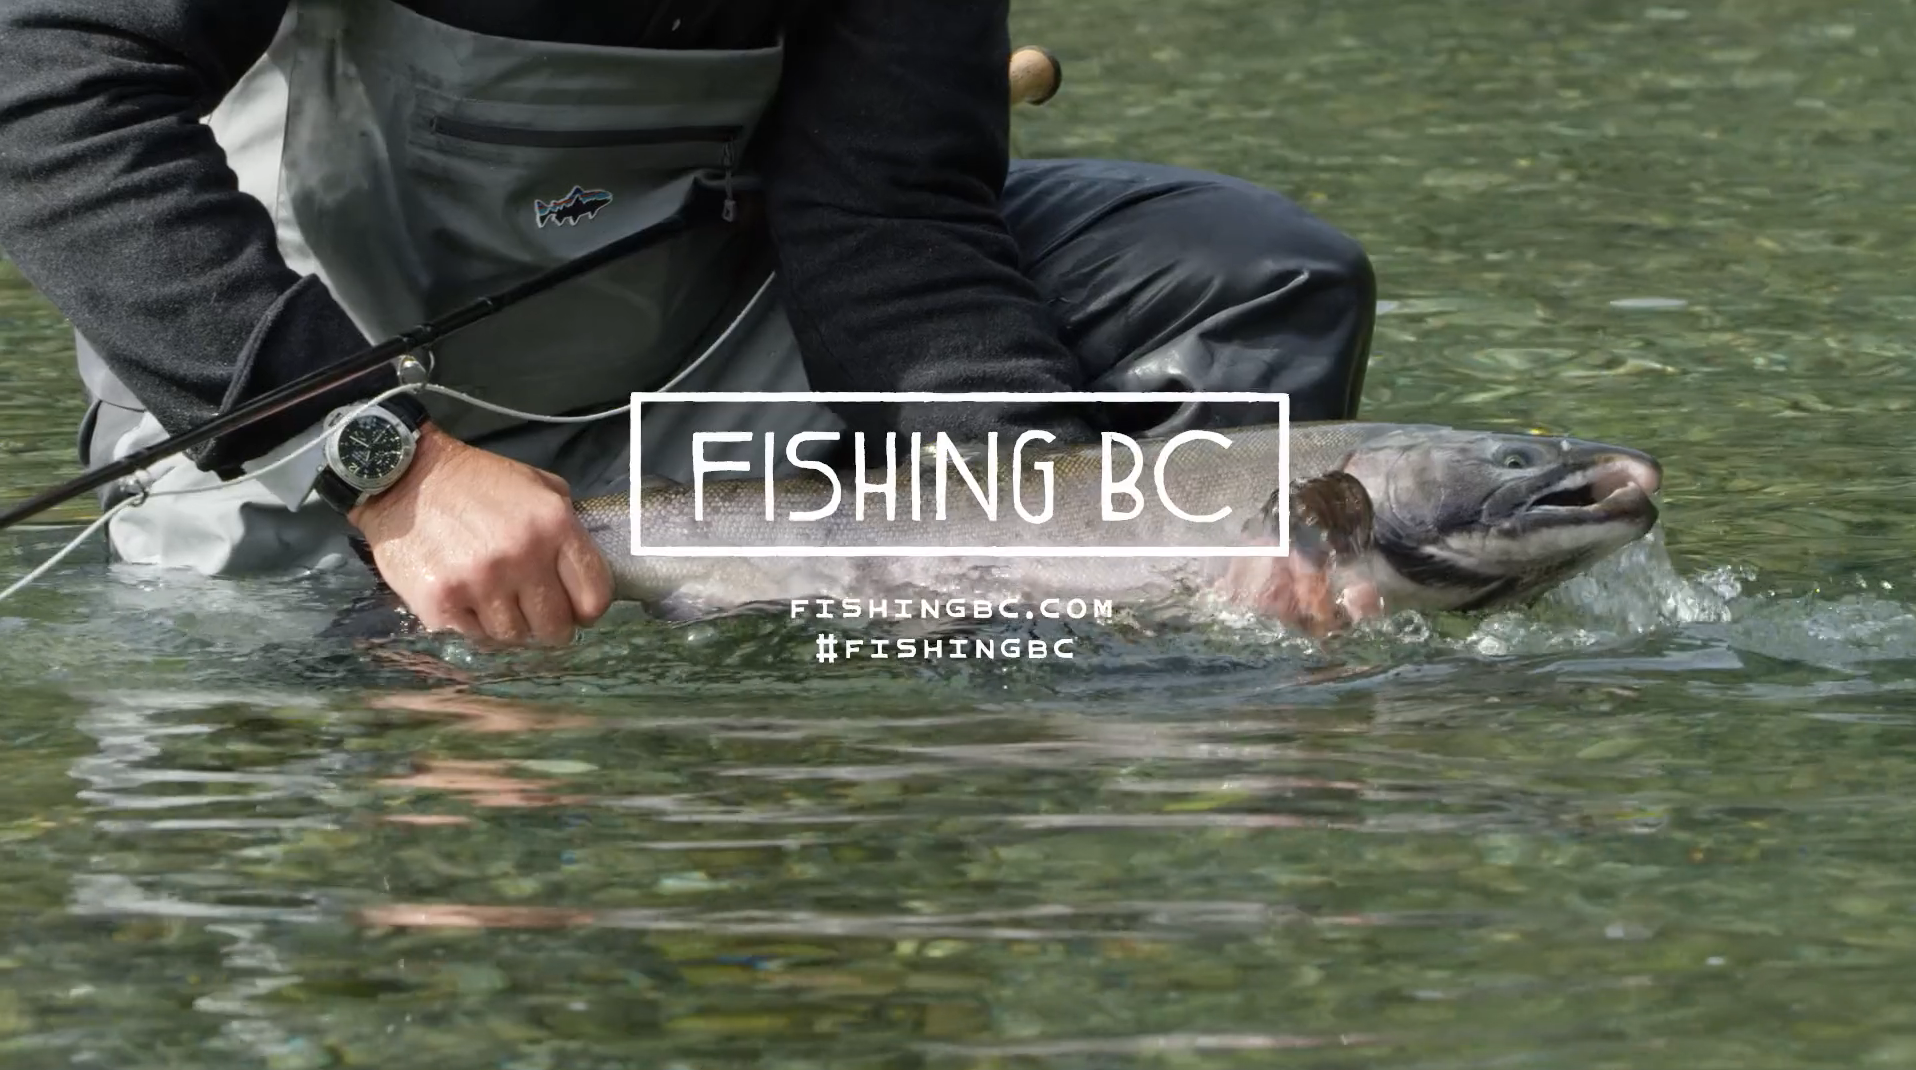 Fishing BC - Clayoquot Helifishing